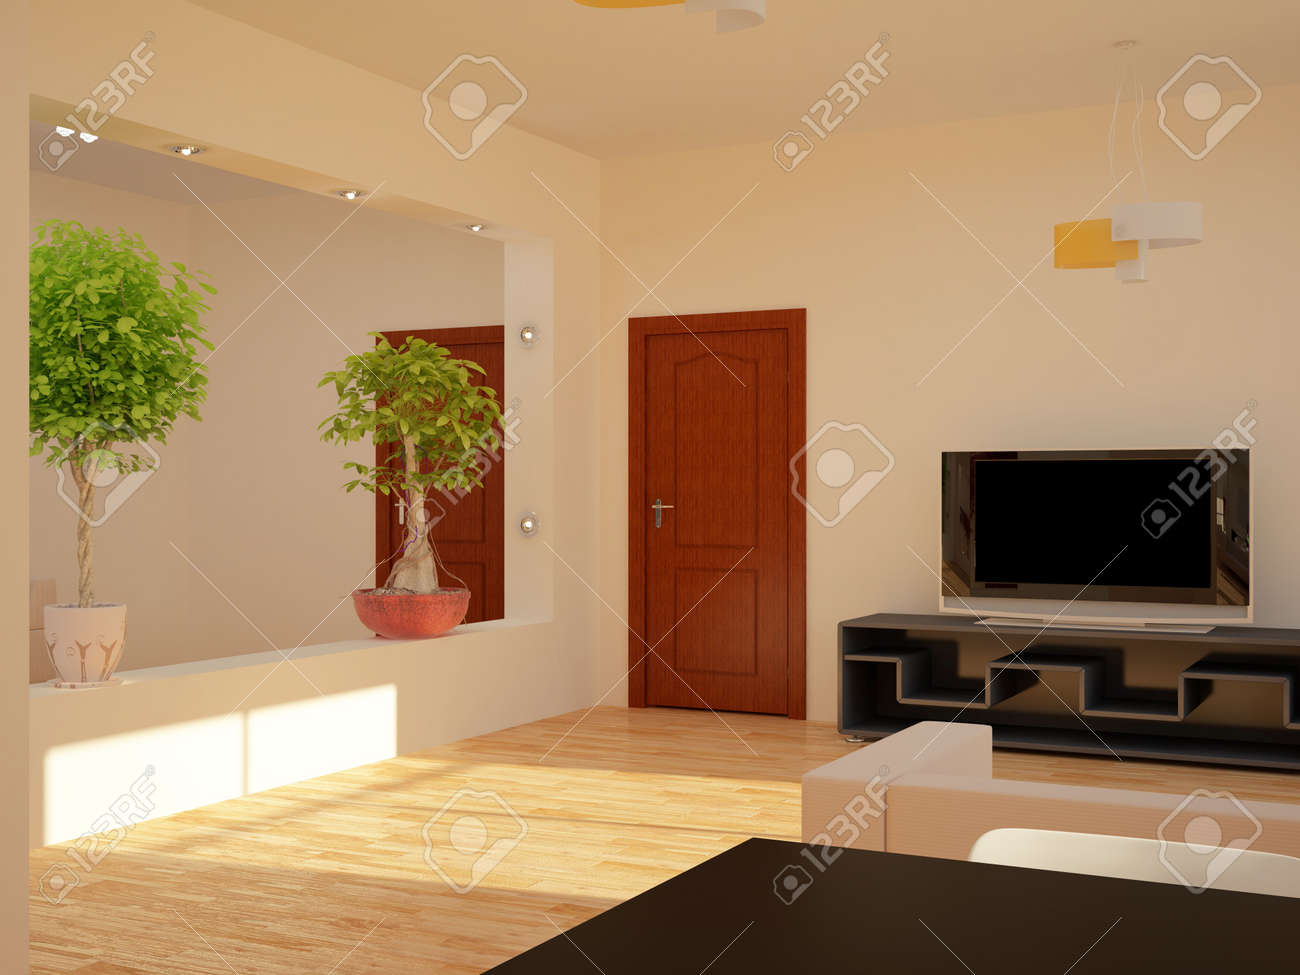 High resolution image interior. 3d illustration modern interior. Stock Photo - 5192655